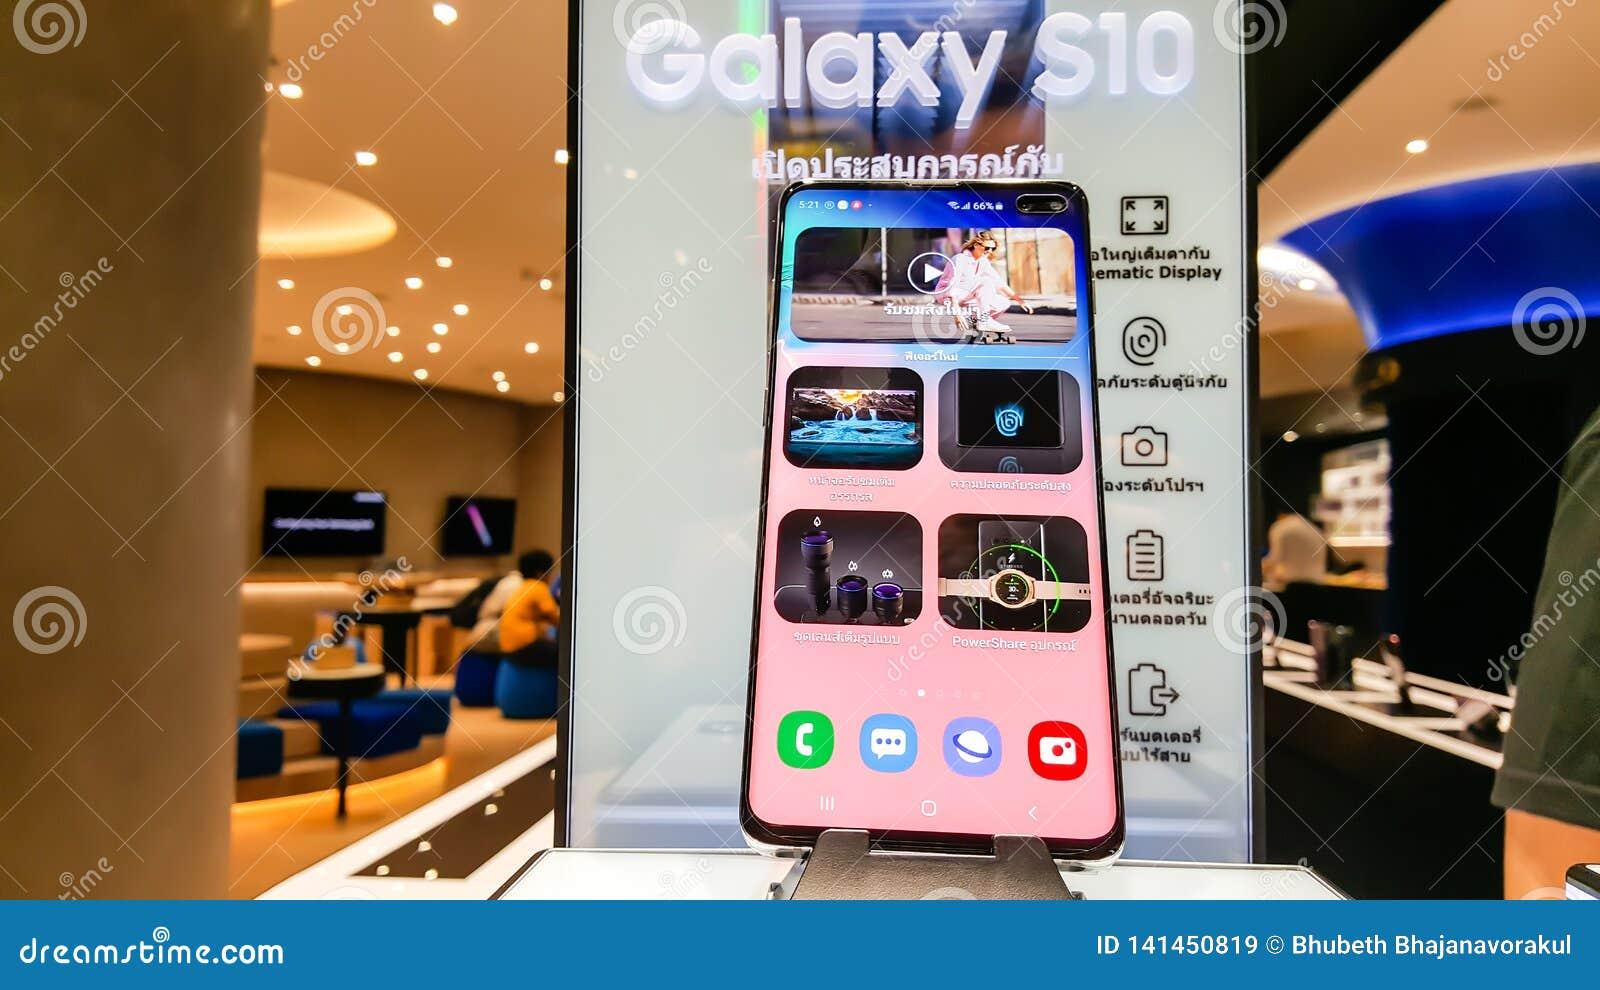 Galaxy Auto Mall >> Bangkok Thailand February 22 2019 Samsung Galaxy S10